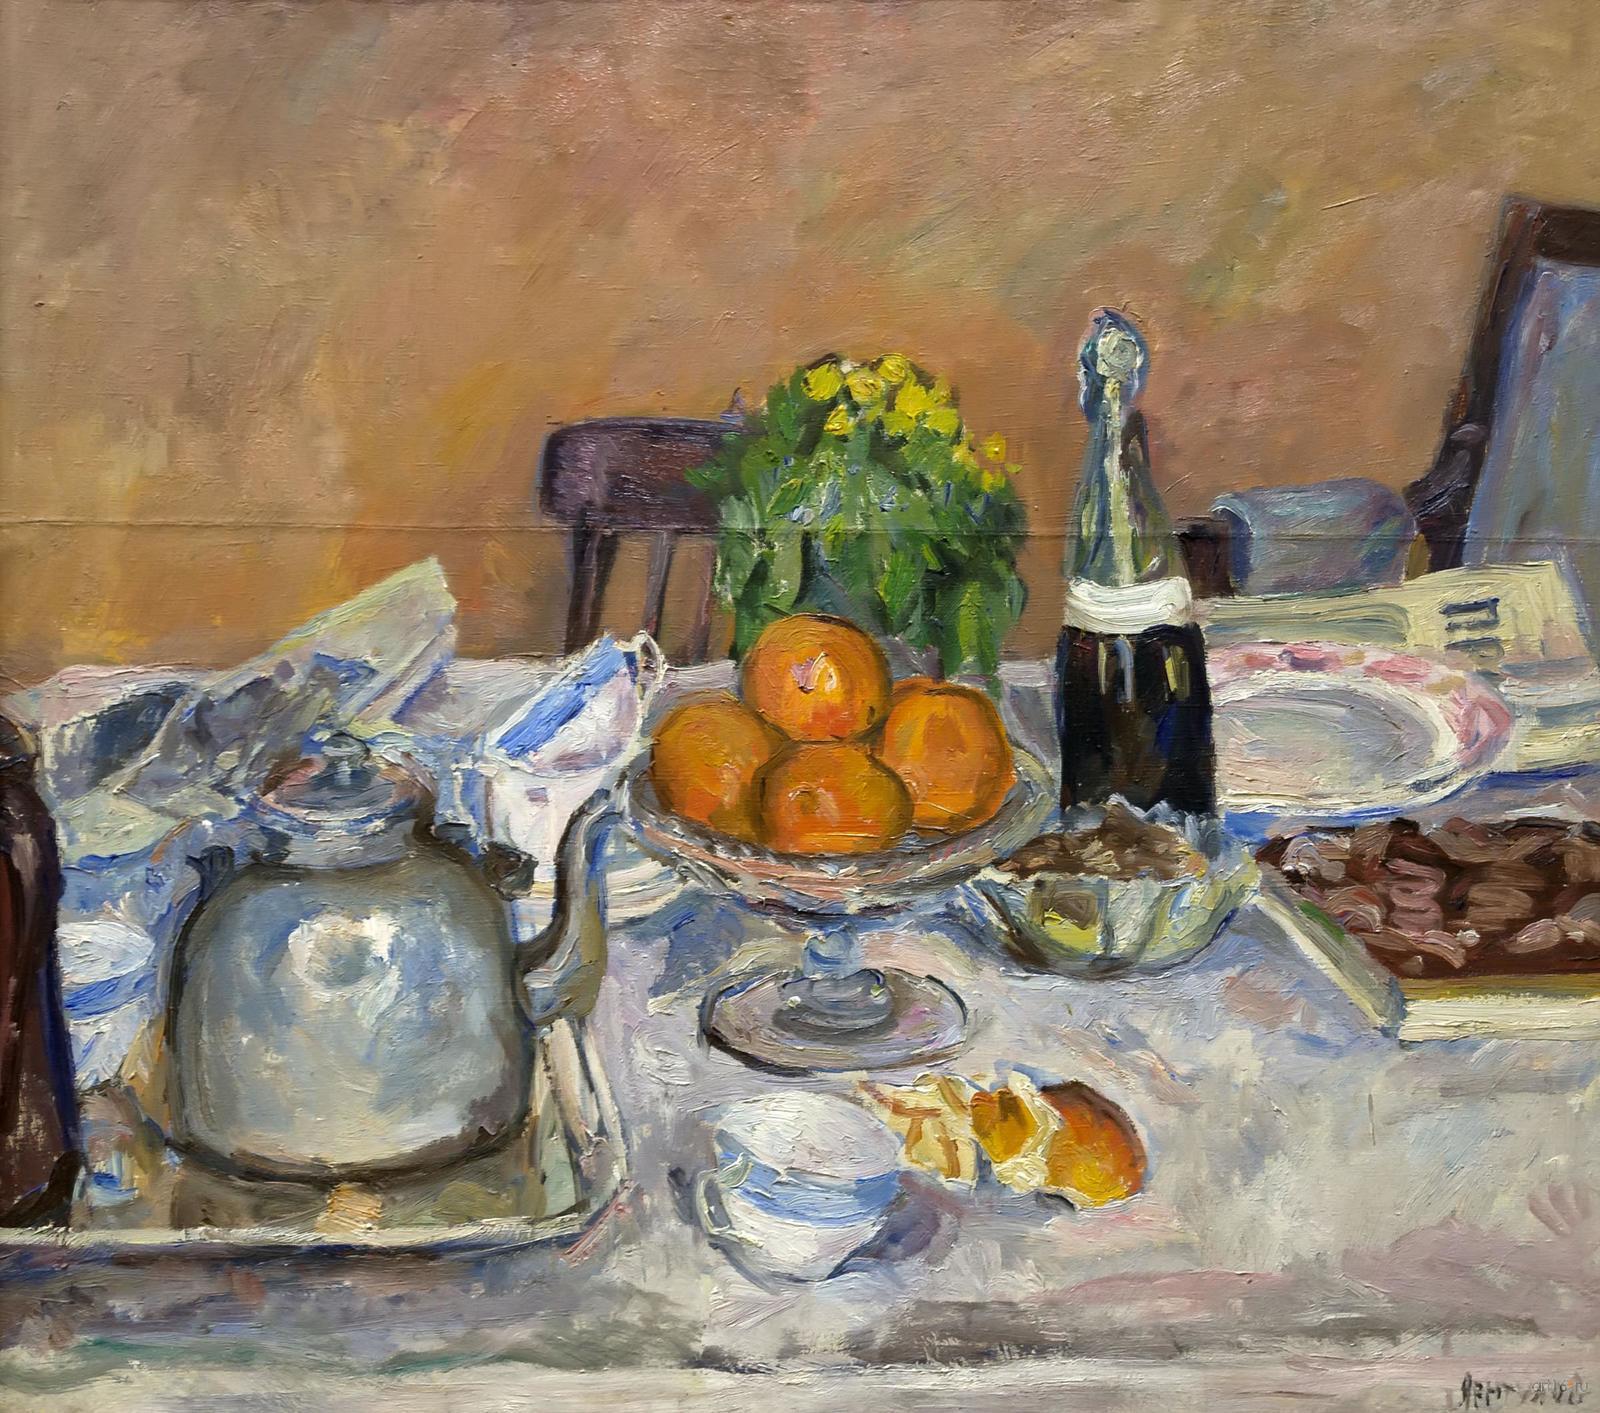 Фото №861013. Натюрморт. Праздничный стол. 1932. Лентулов Аристарх Васильевич. 1882-1943